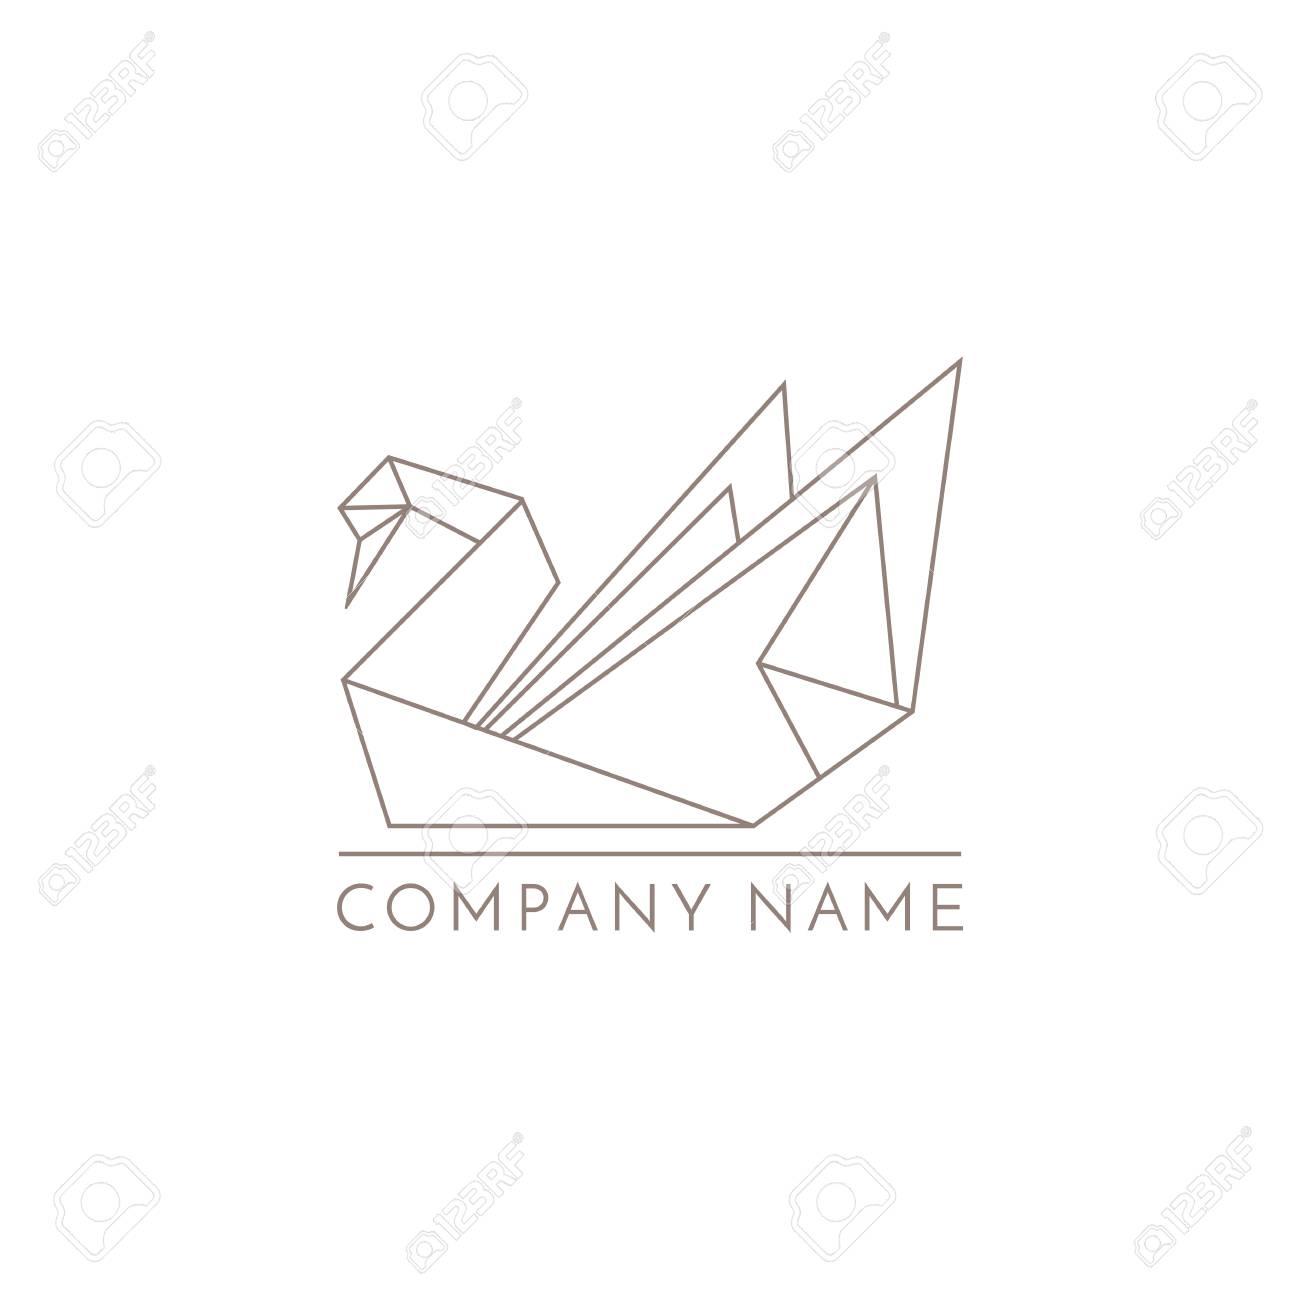 Swan logo origami line sign on white background stock photo swan logo origami line sign on white background stock photo 87335925 jeuxipadfo Gallery